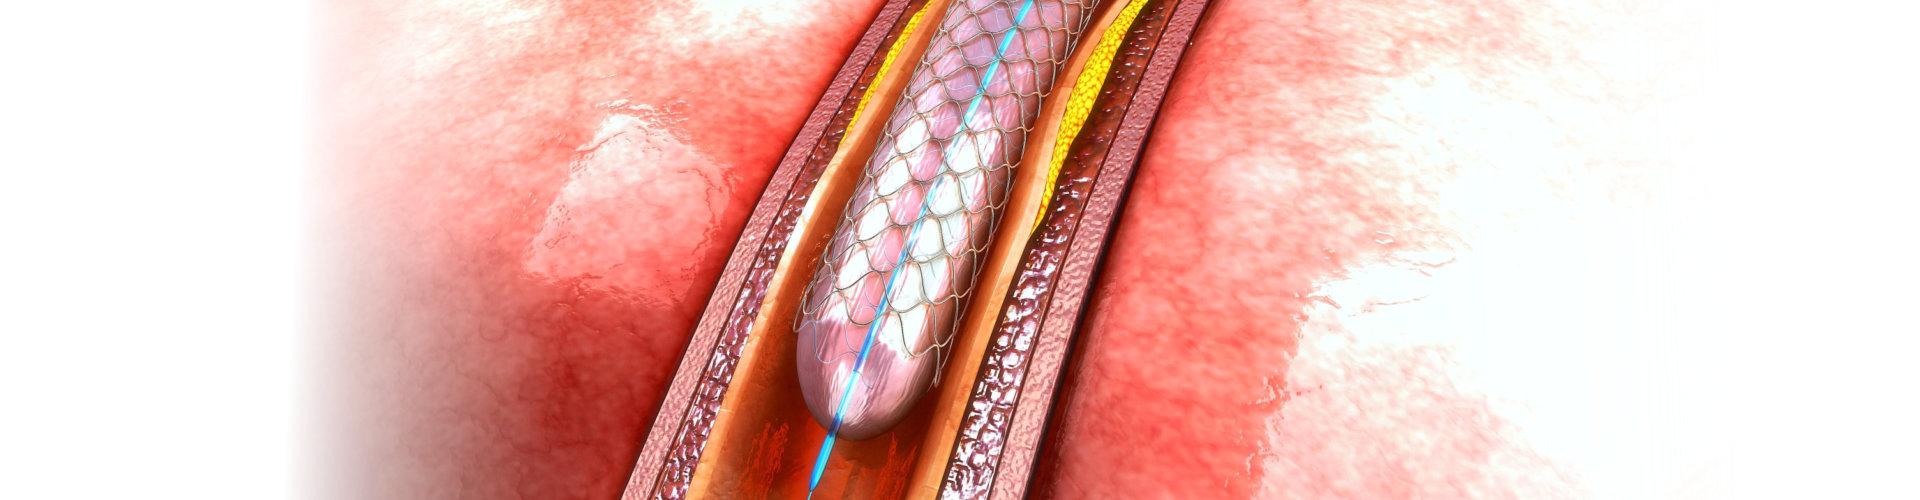 3d rendered angioplasty